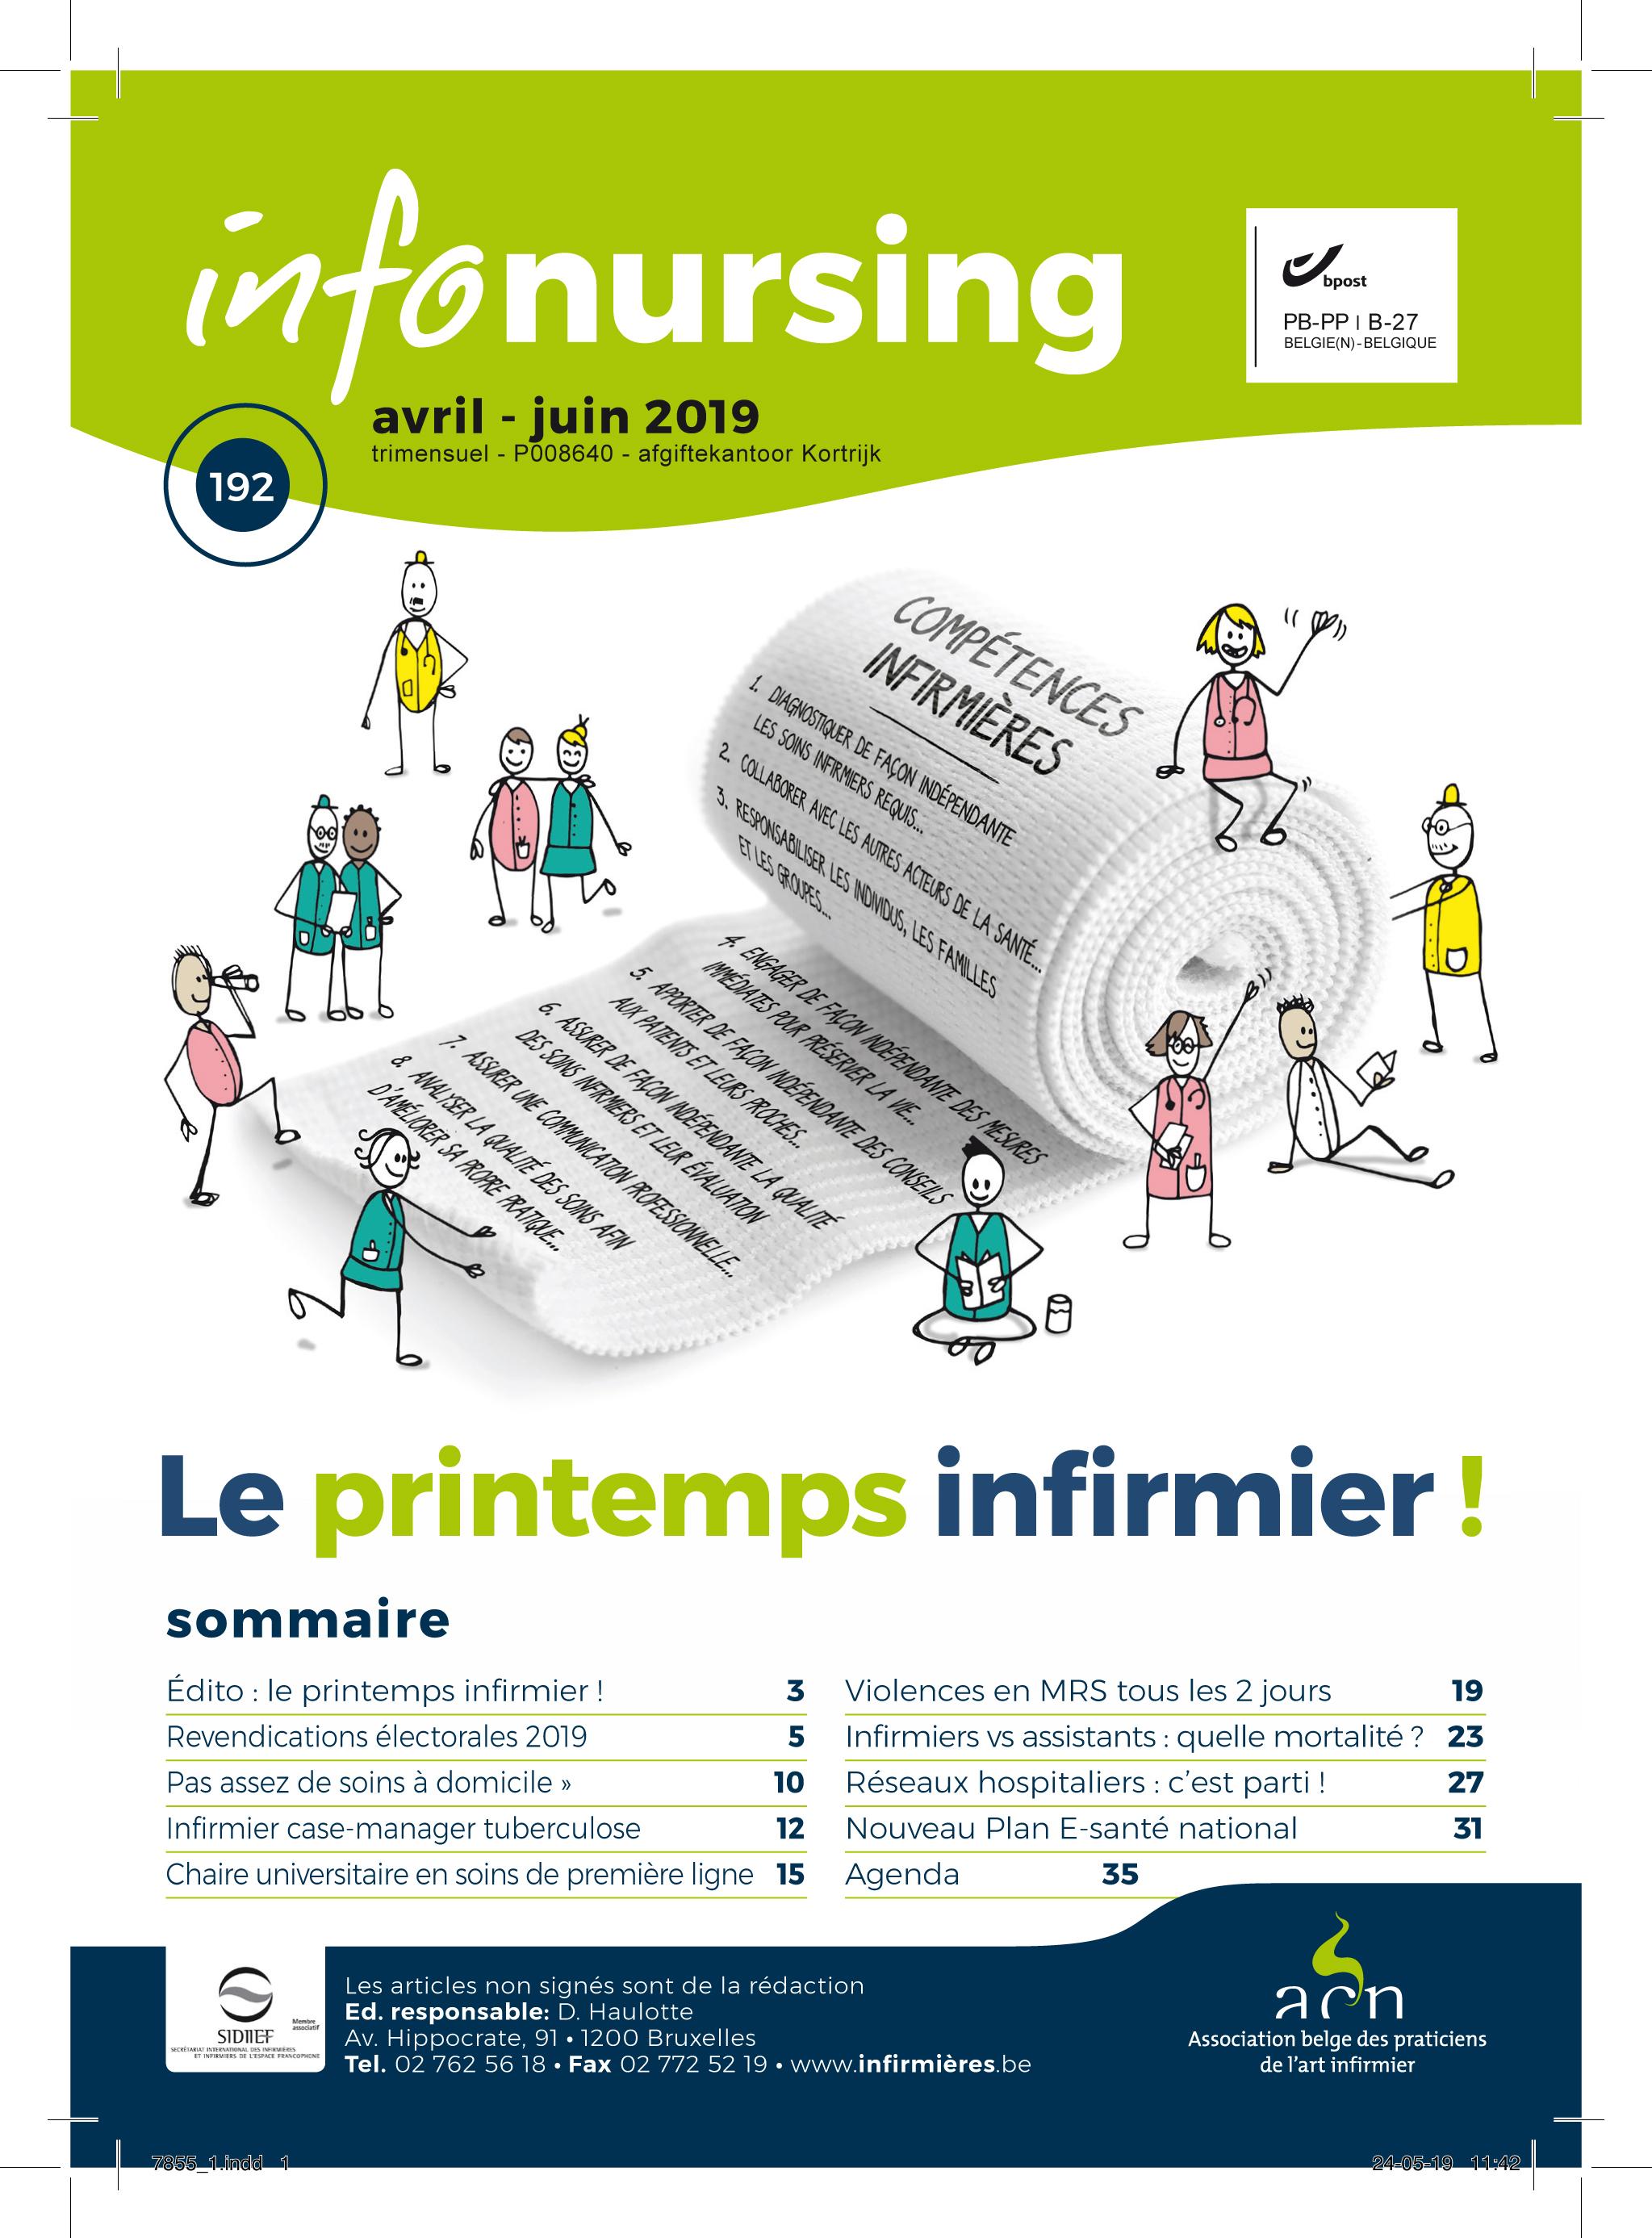 Edito Info-Nursing 192 : Le printemps infirmier !